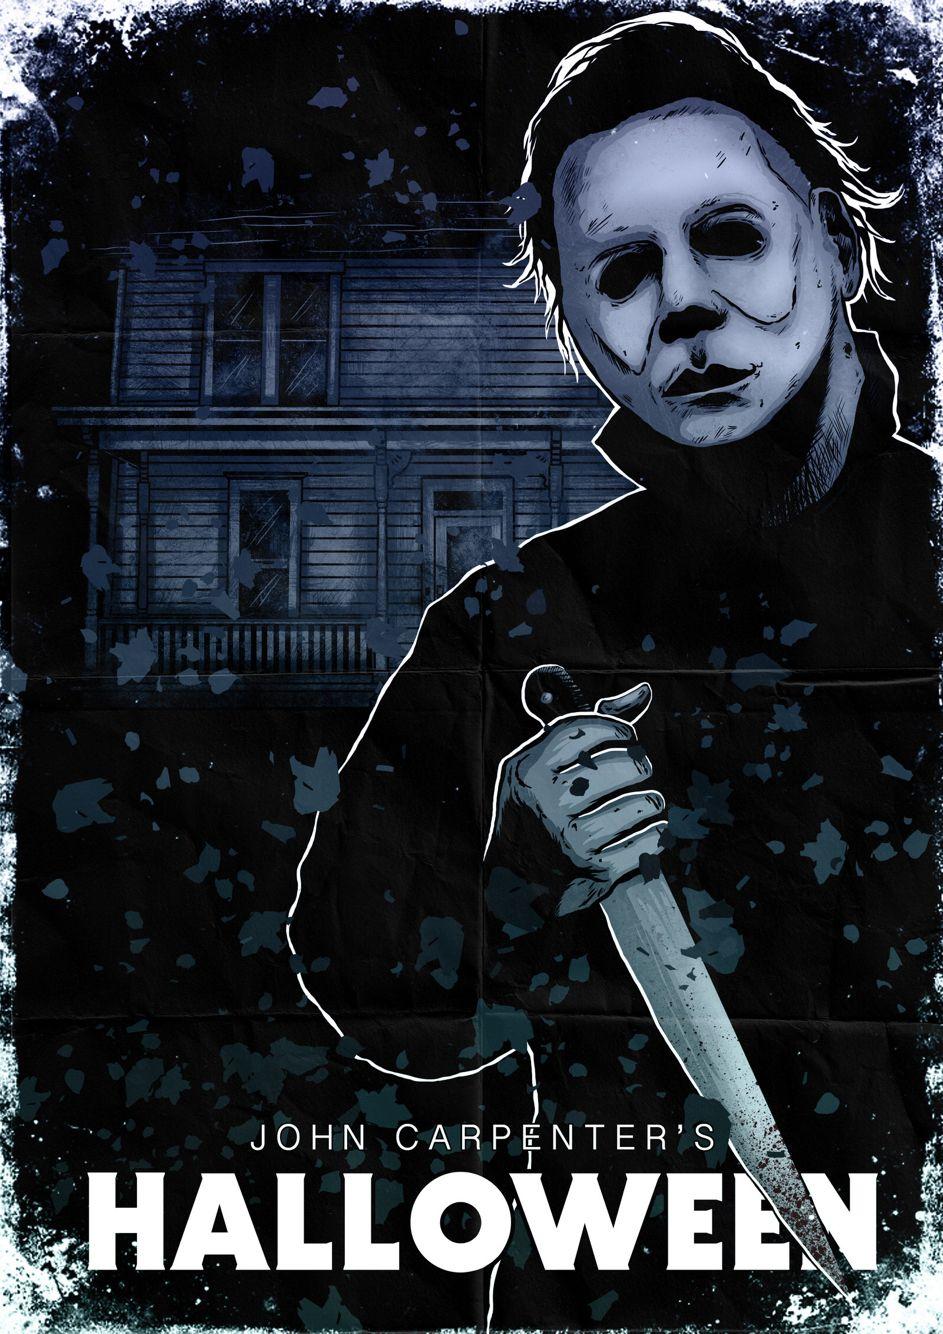 Halloween, Michael, House, Art Michael myers halloween